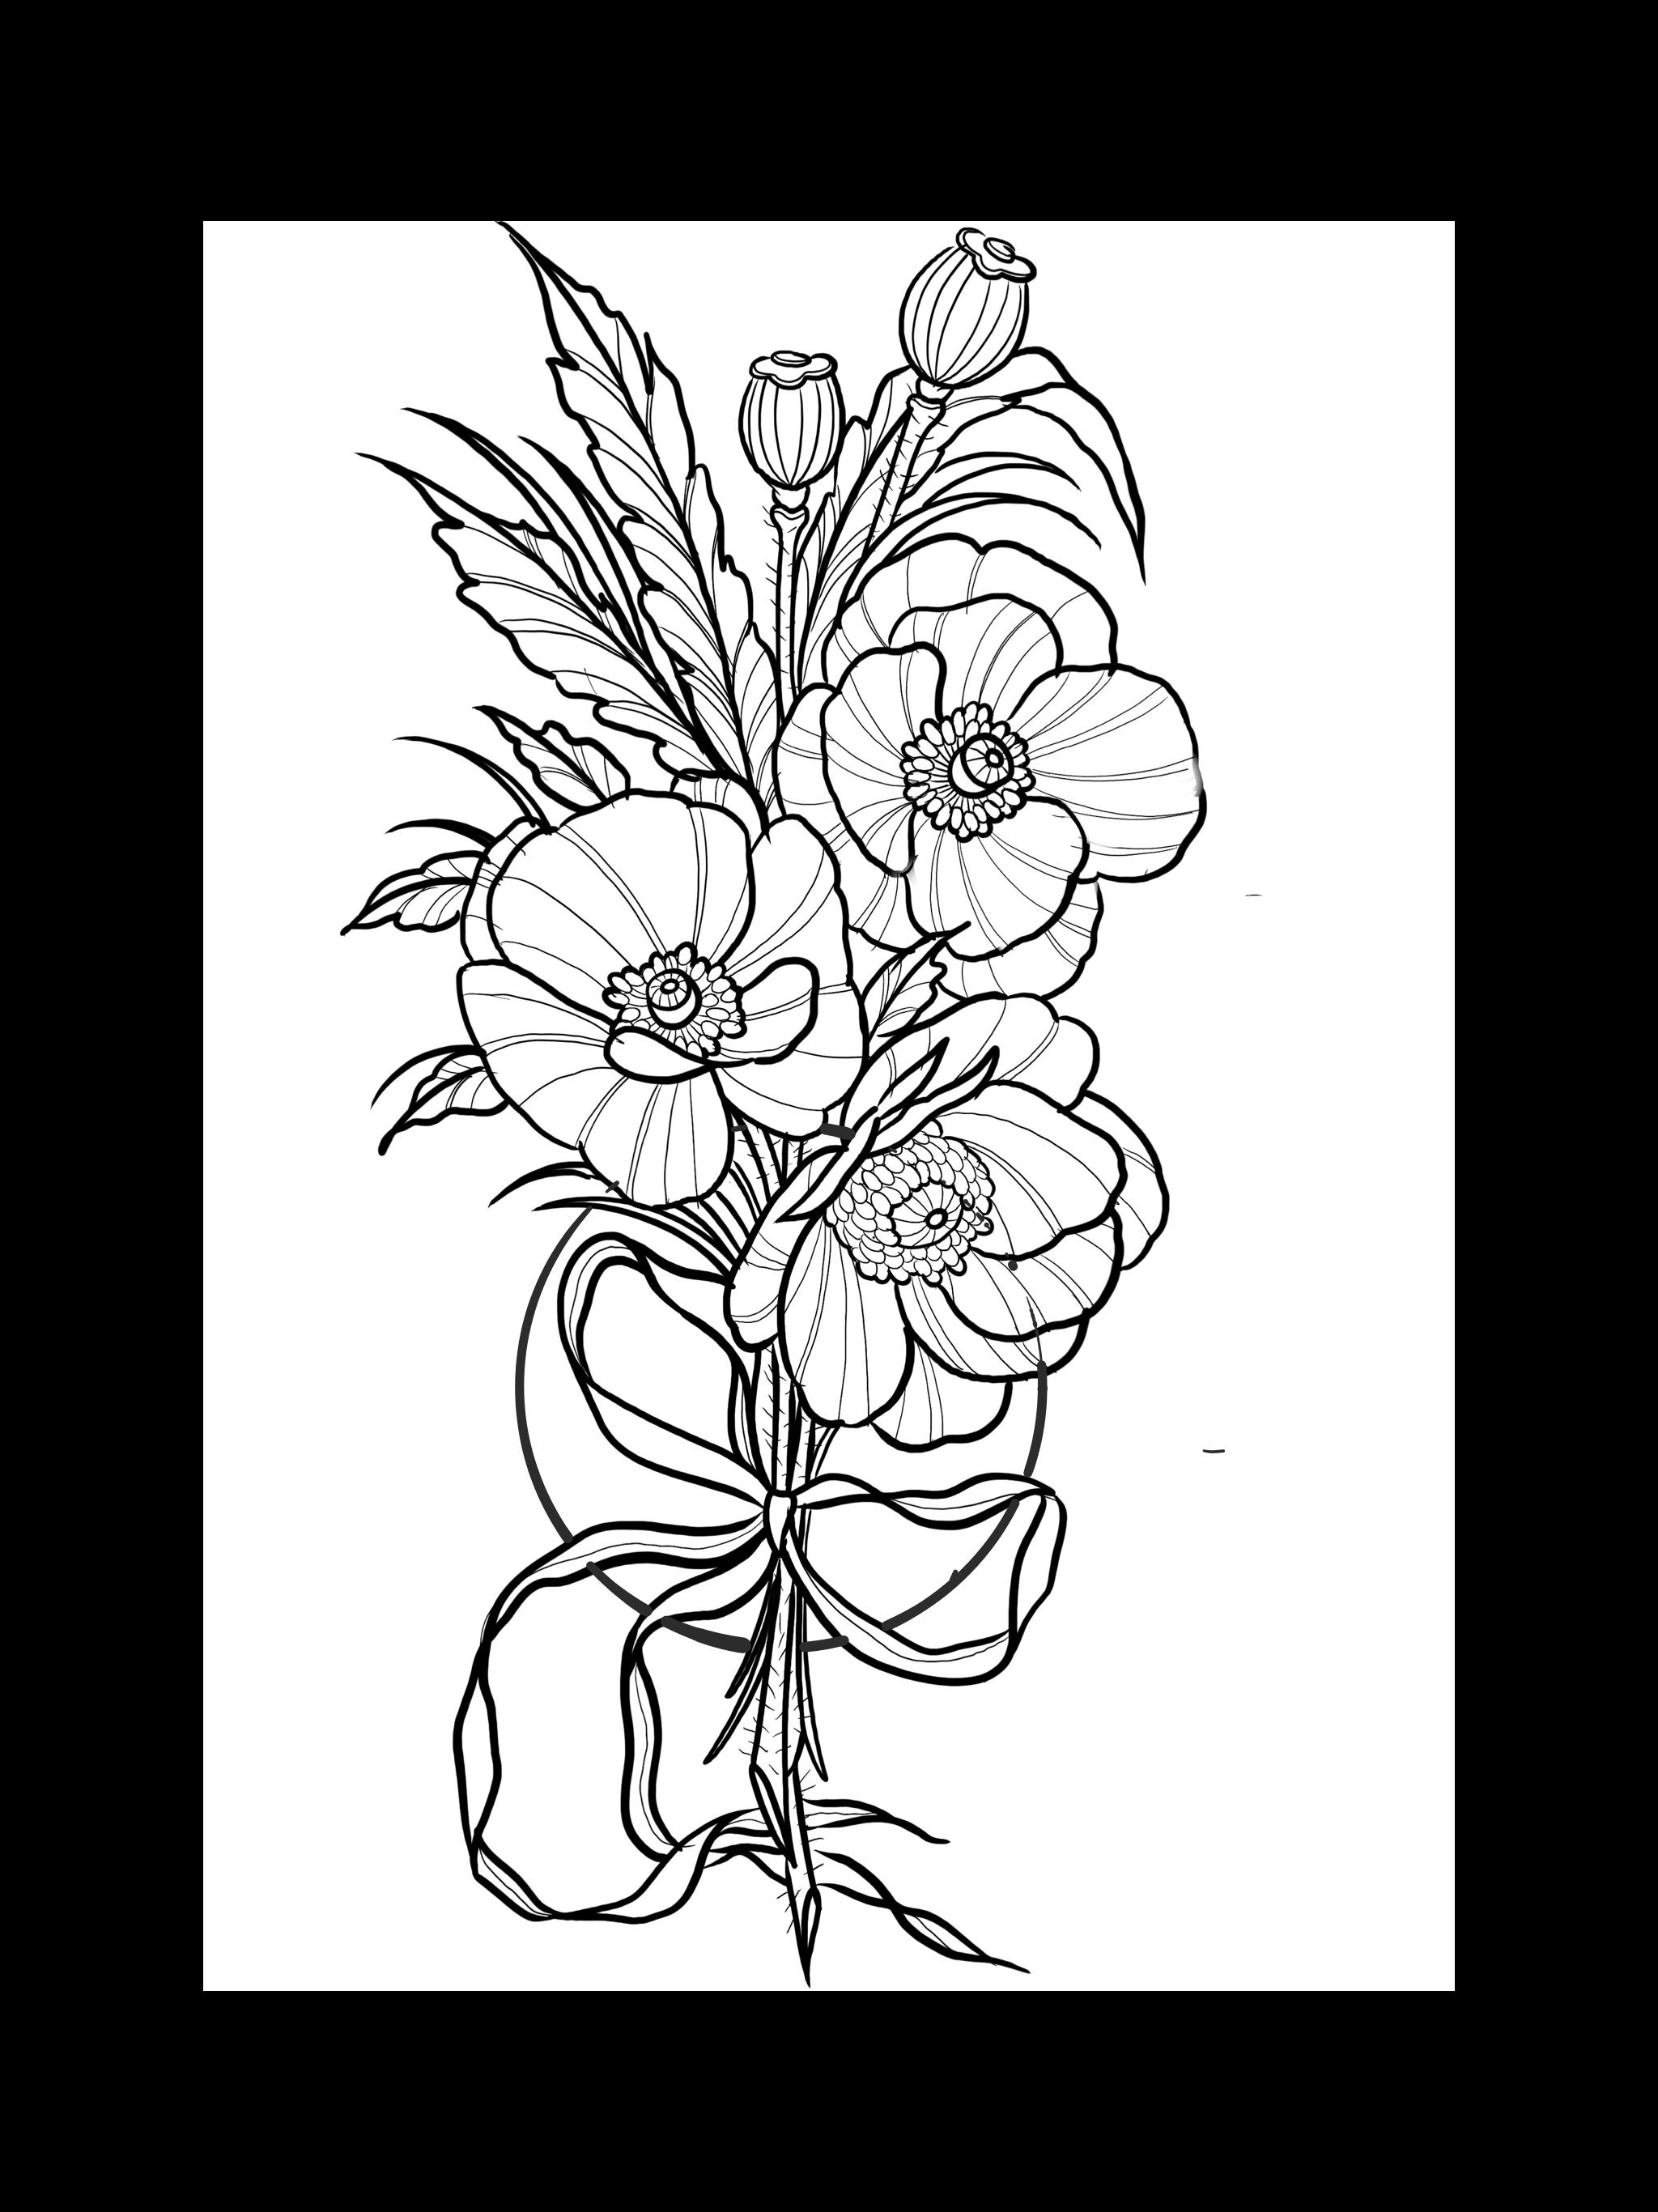 Tattooidee Tattoosketch Tattoodrawing Universe Universetatto Tattooart Poppyflower Flowertattoo Flower Sketches Flower Drawing Tumblr Flower Drawing